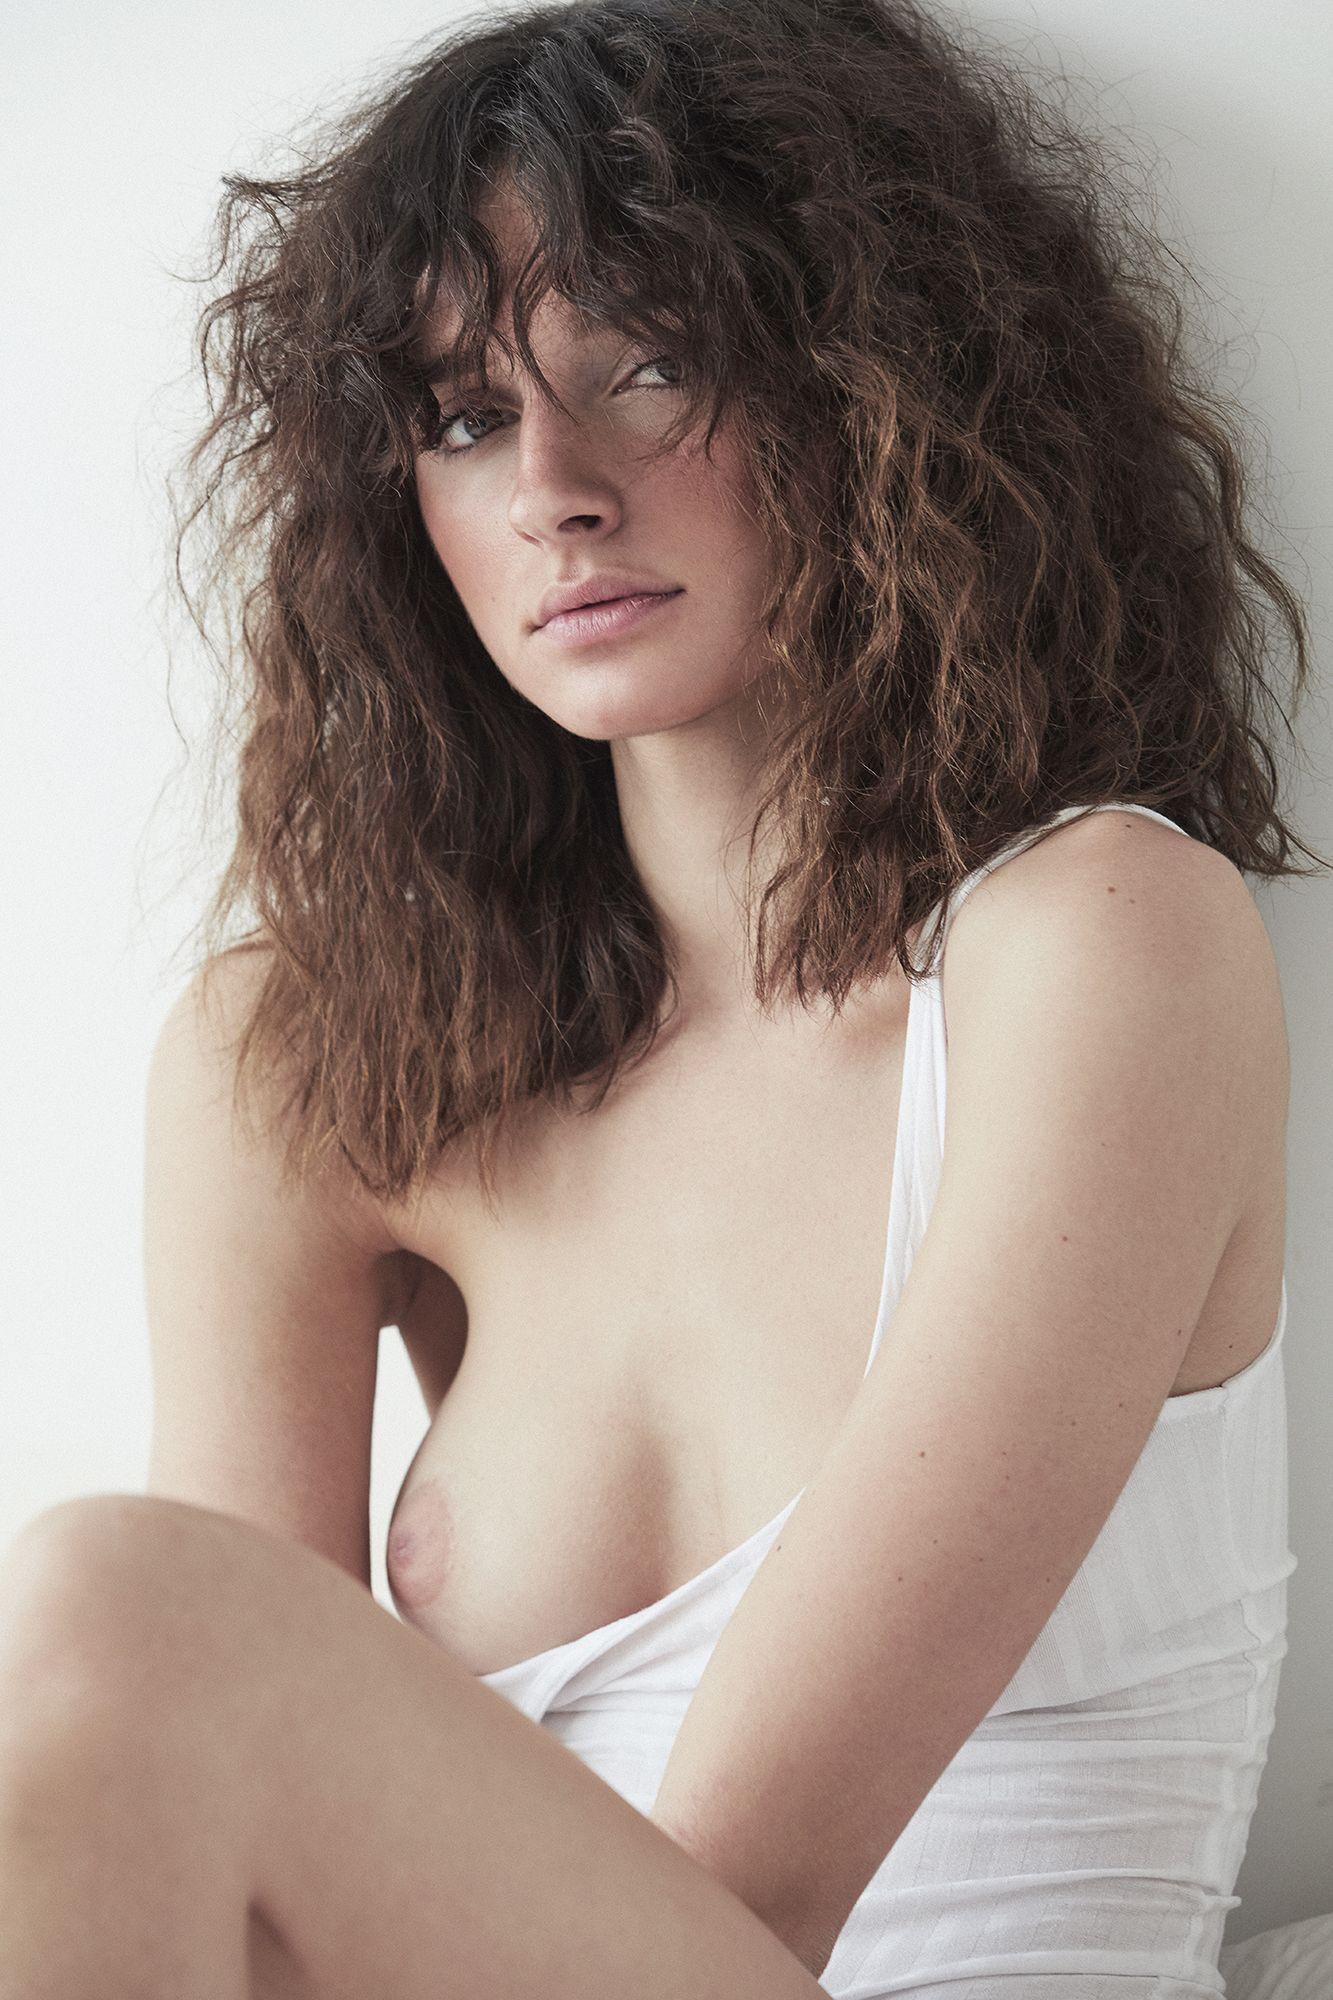 ICloud Pilar Magro naked (95 photos), Topless, Sideboobs, Twitter, butt 2018